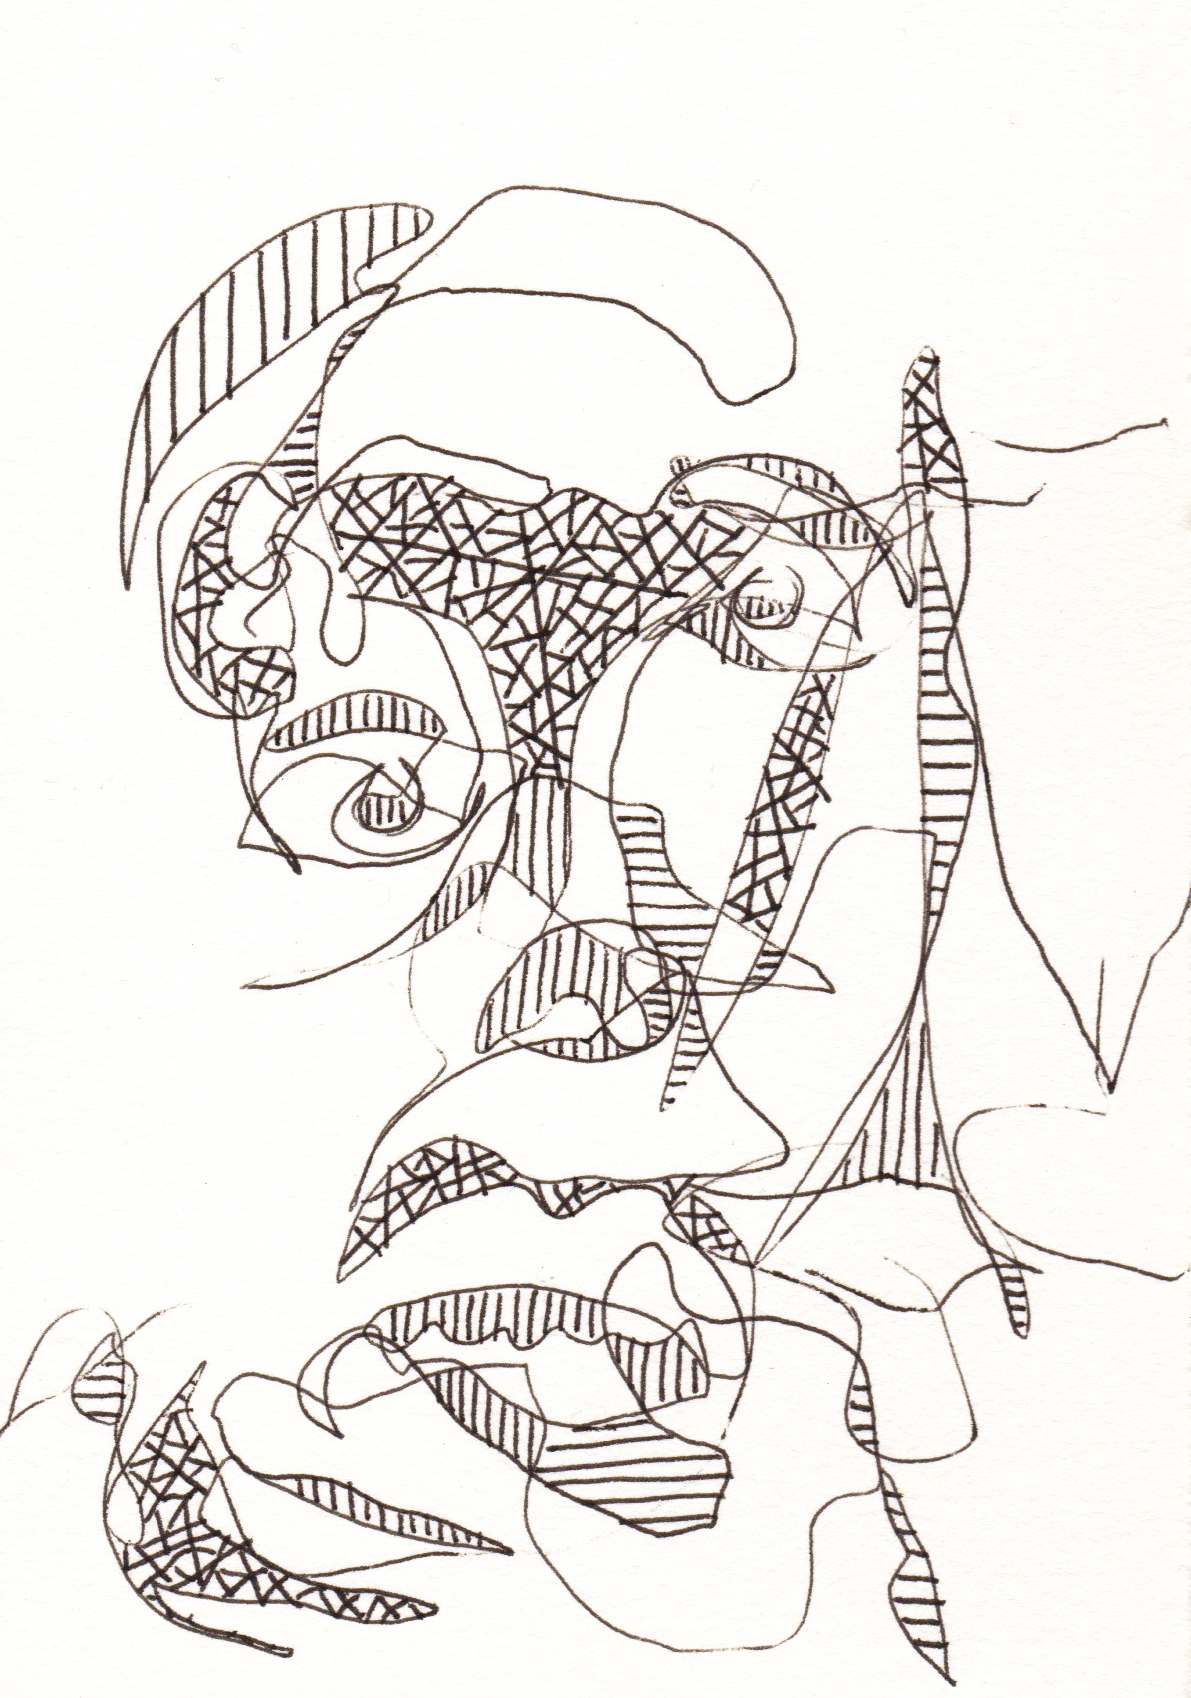 "Pen on Paper 4"" x 6"""